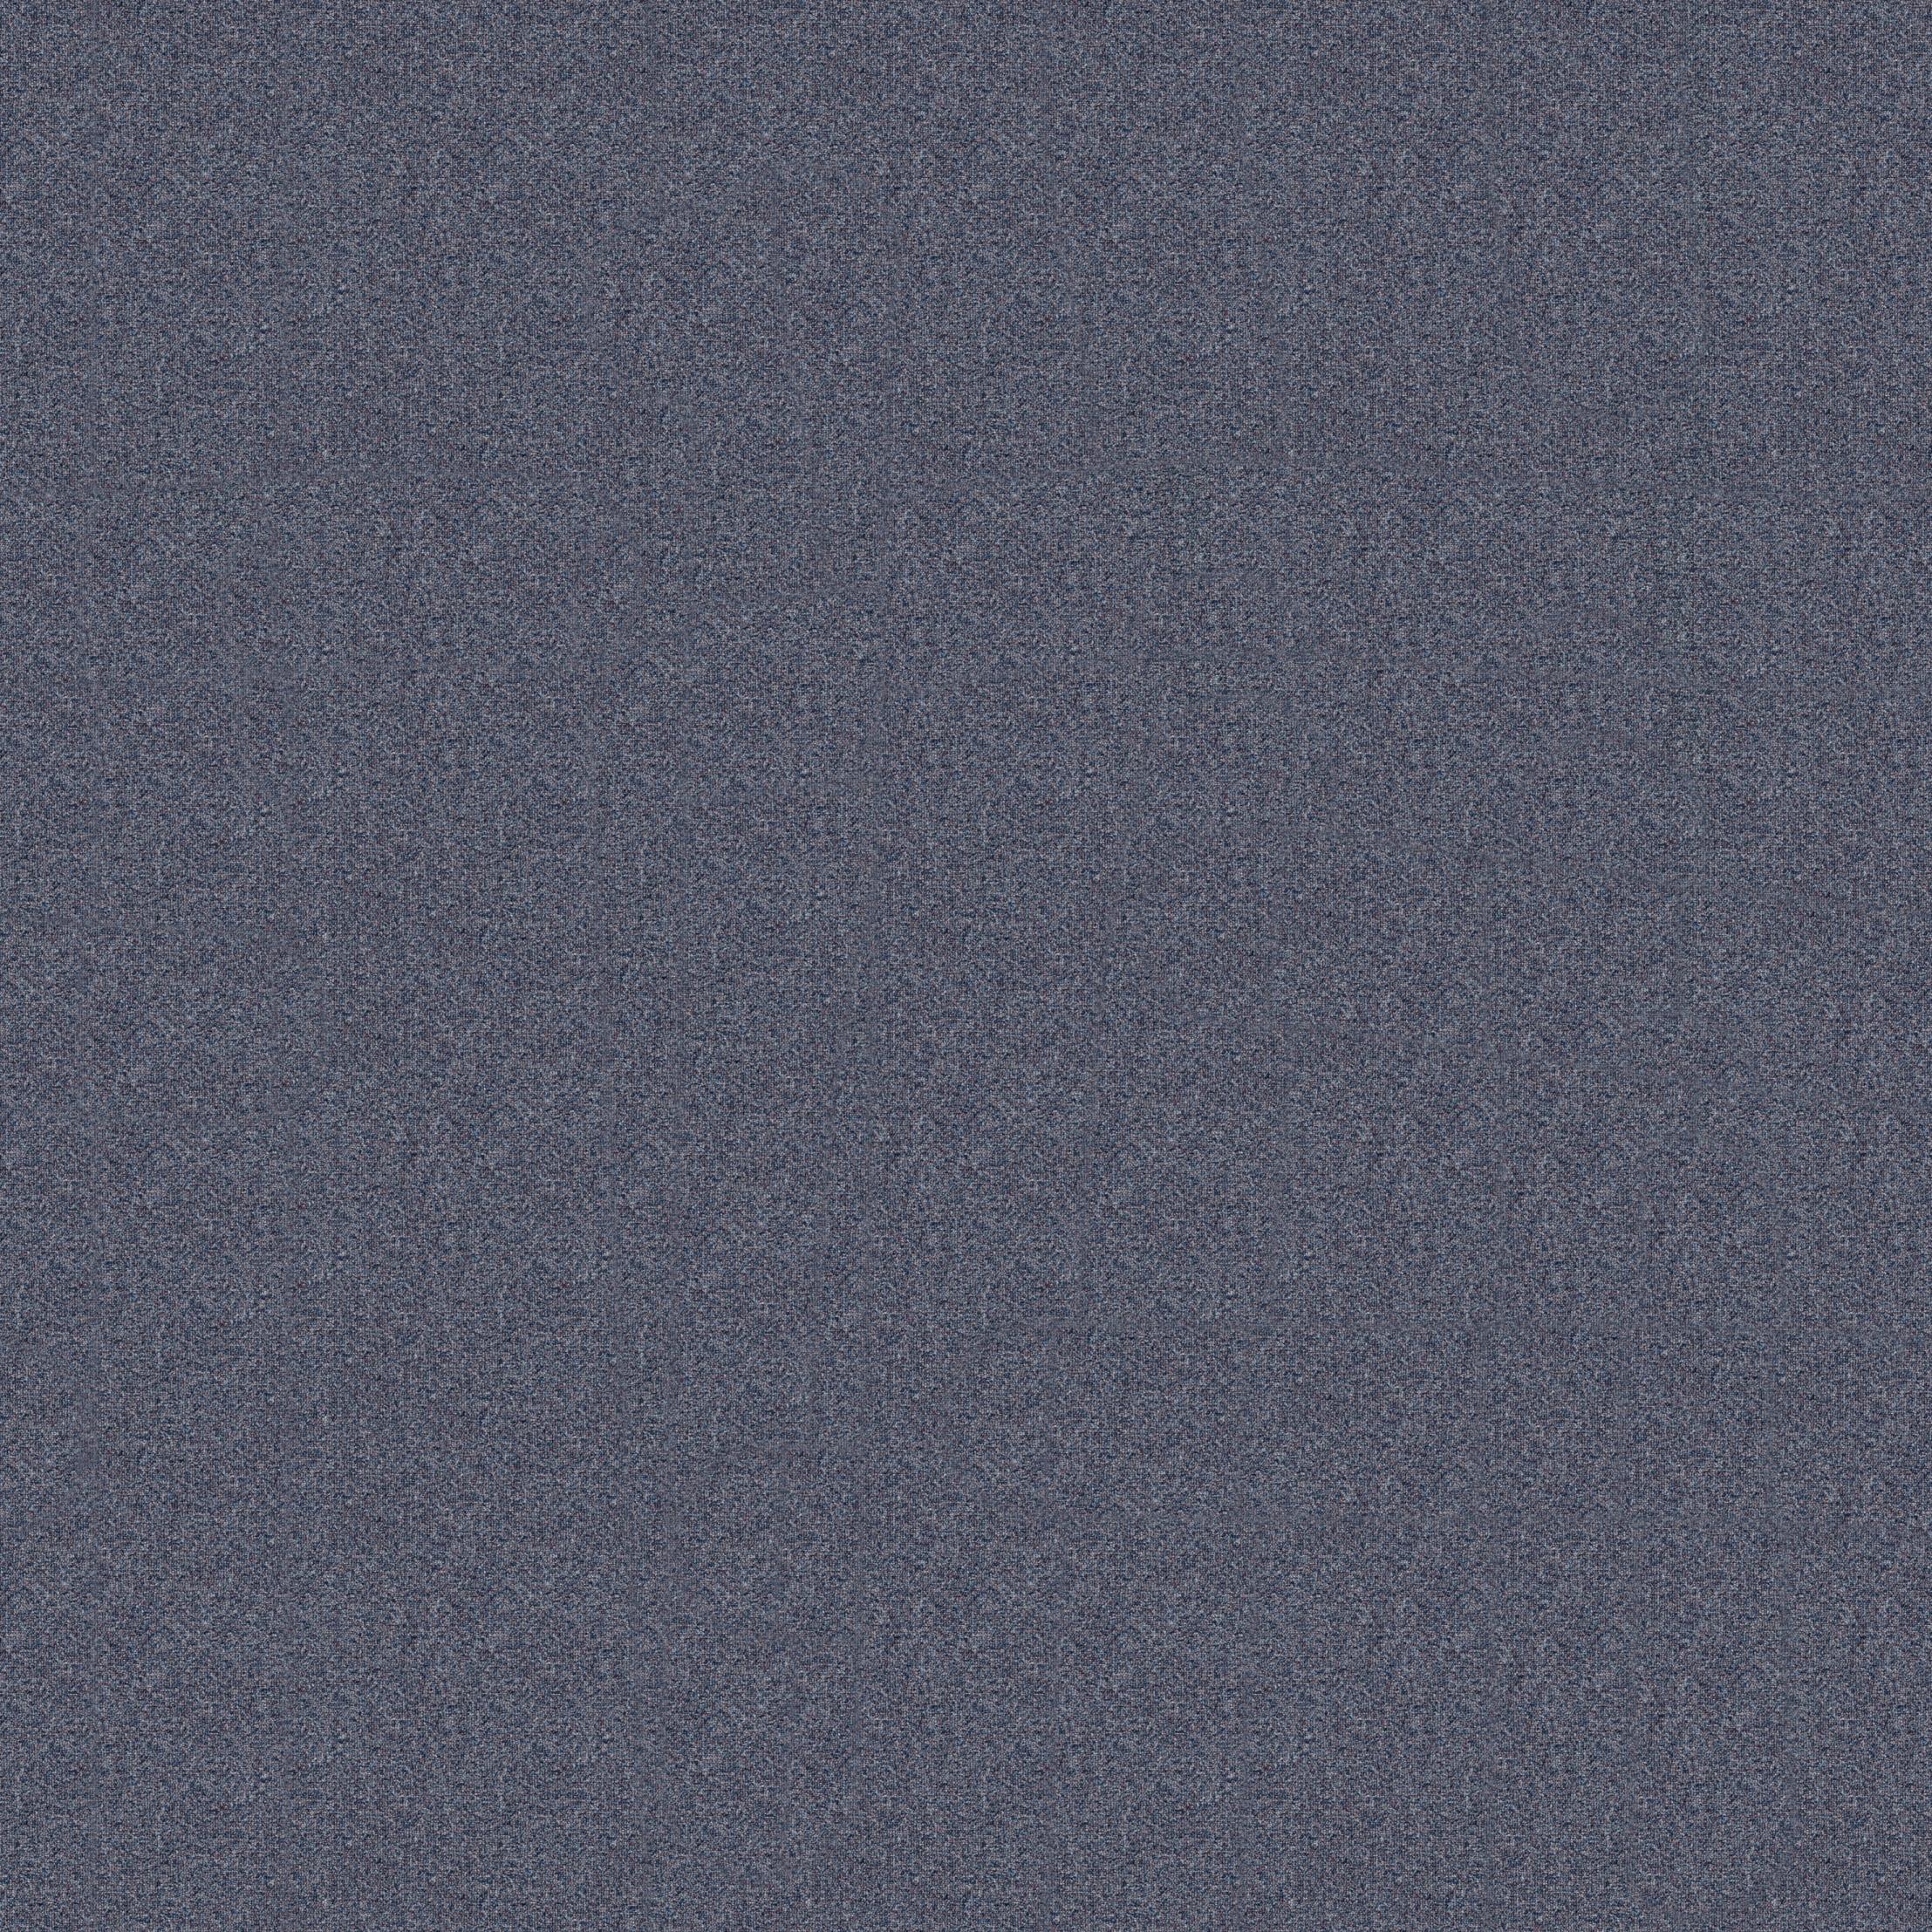 Tessera Basis Summary Forbo Flooring Systems